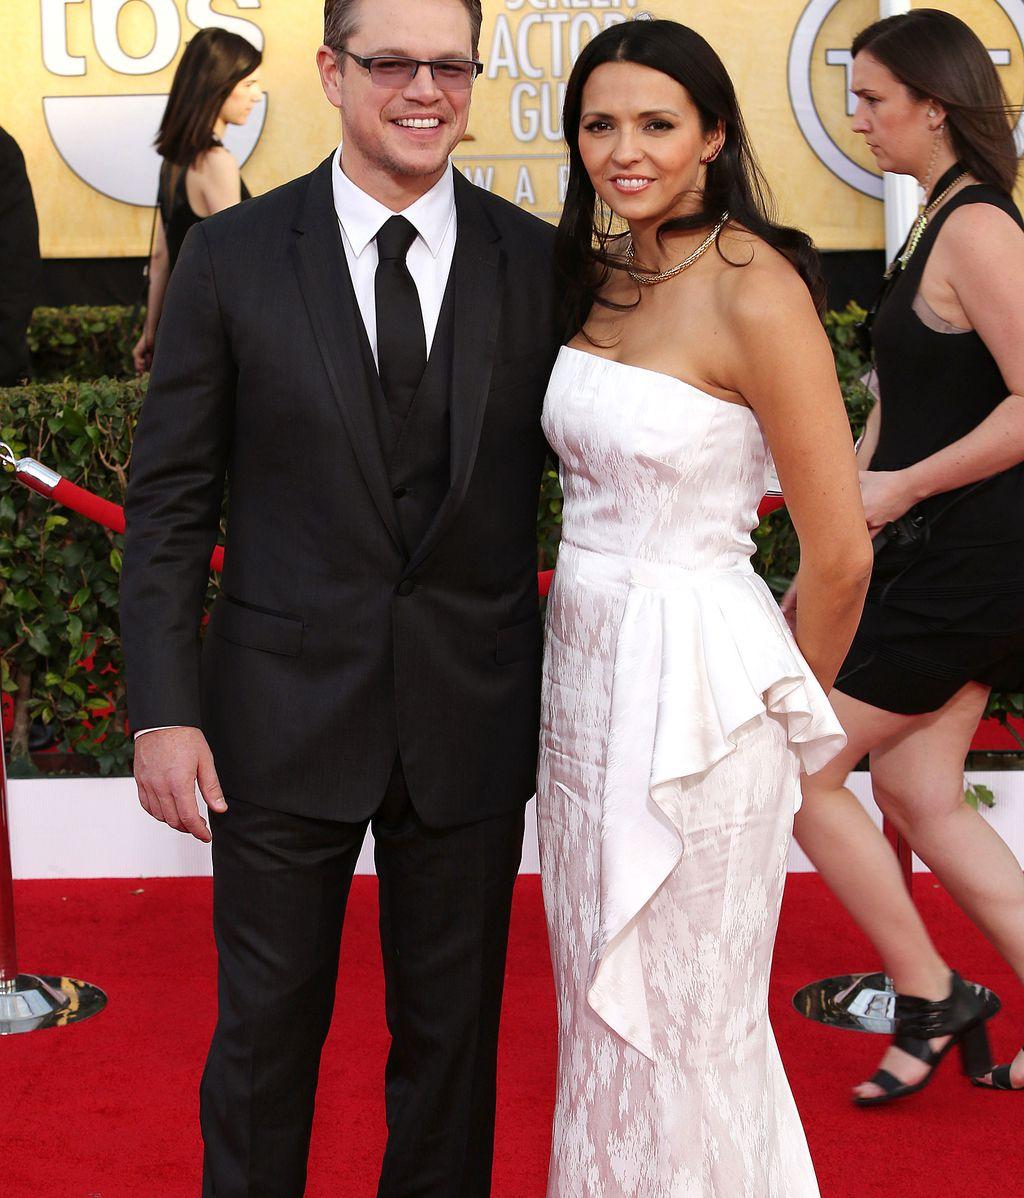 Matt Damon, junto a su mujer Luciana Barroso